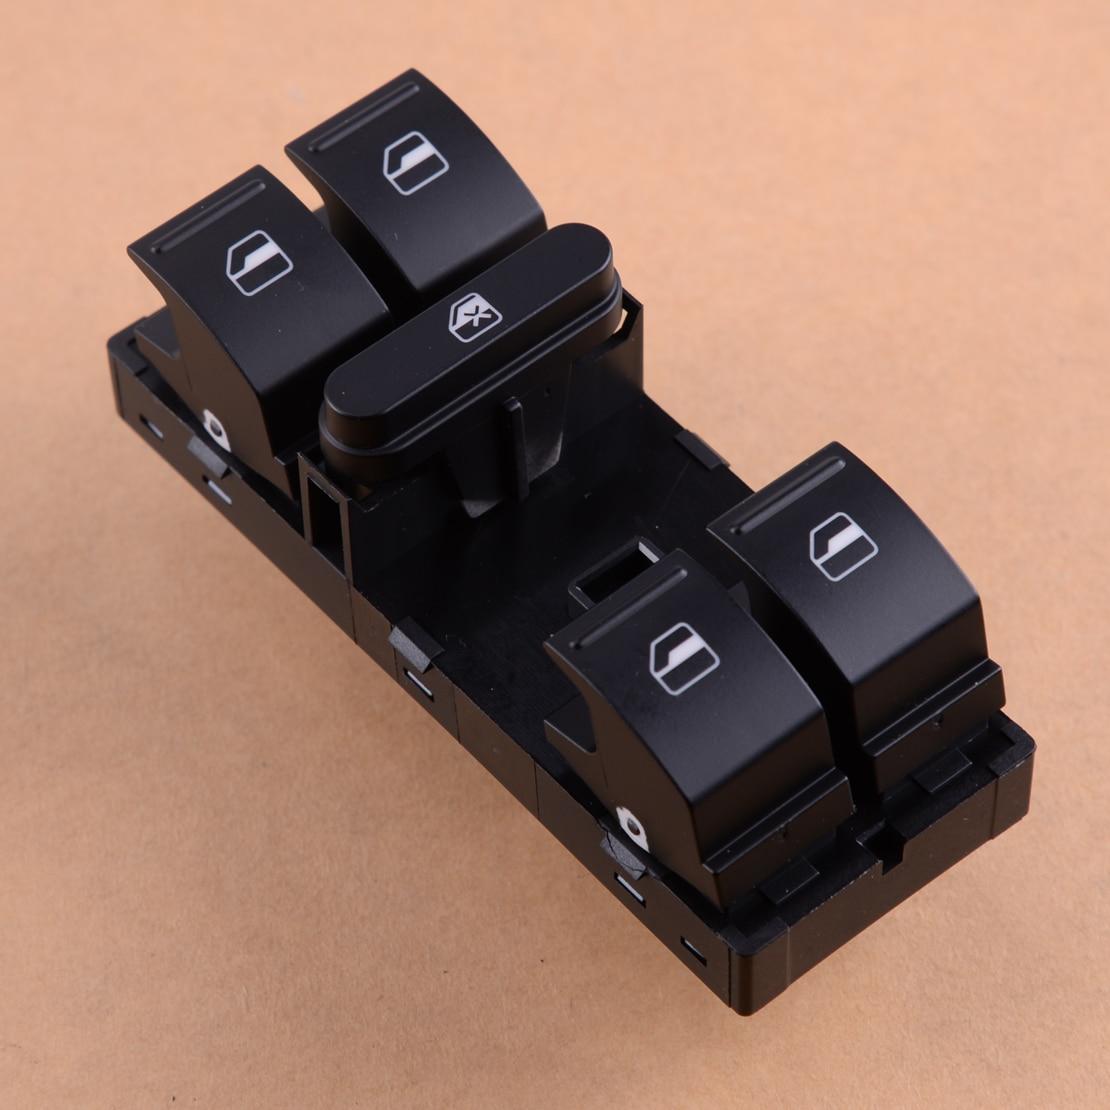 Beler siyah 1K4959857B Master elektrikli pencere anahtarı için Fit Volkswagen Passat Jetta Golf Mk5 Mk6 Tiguan CC Eos GTI tavşan Caddy